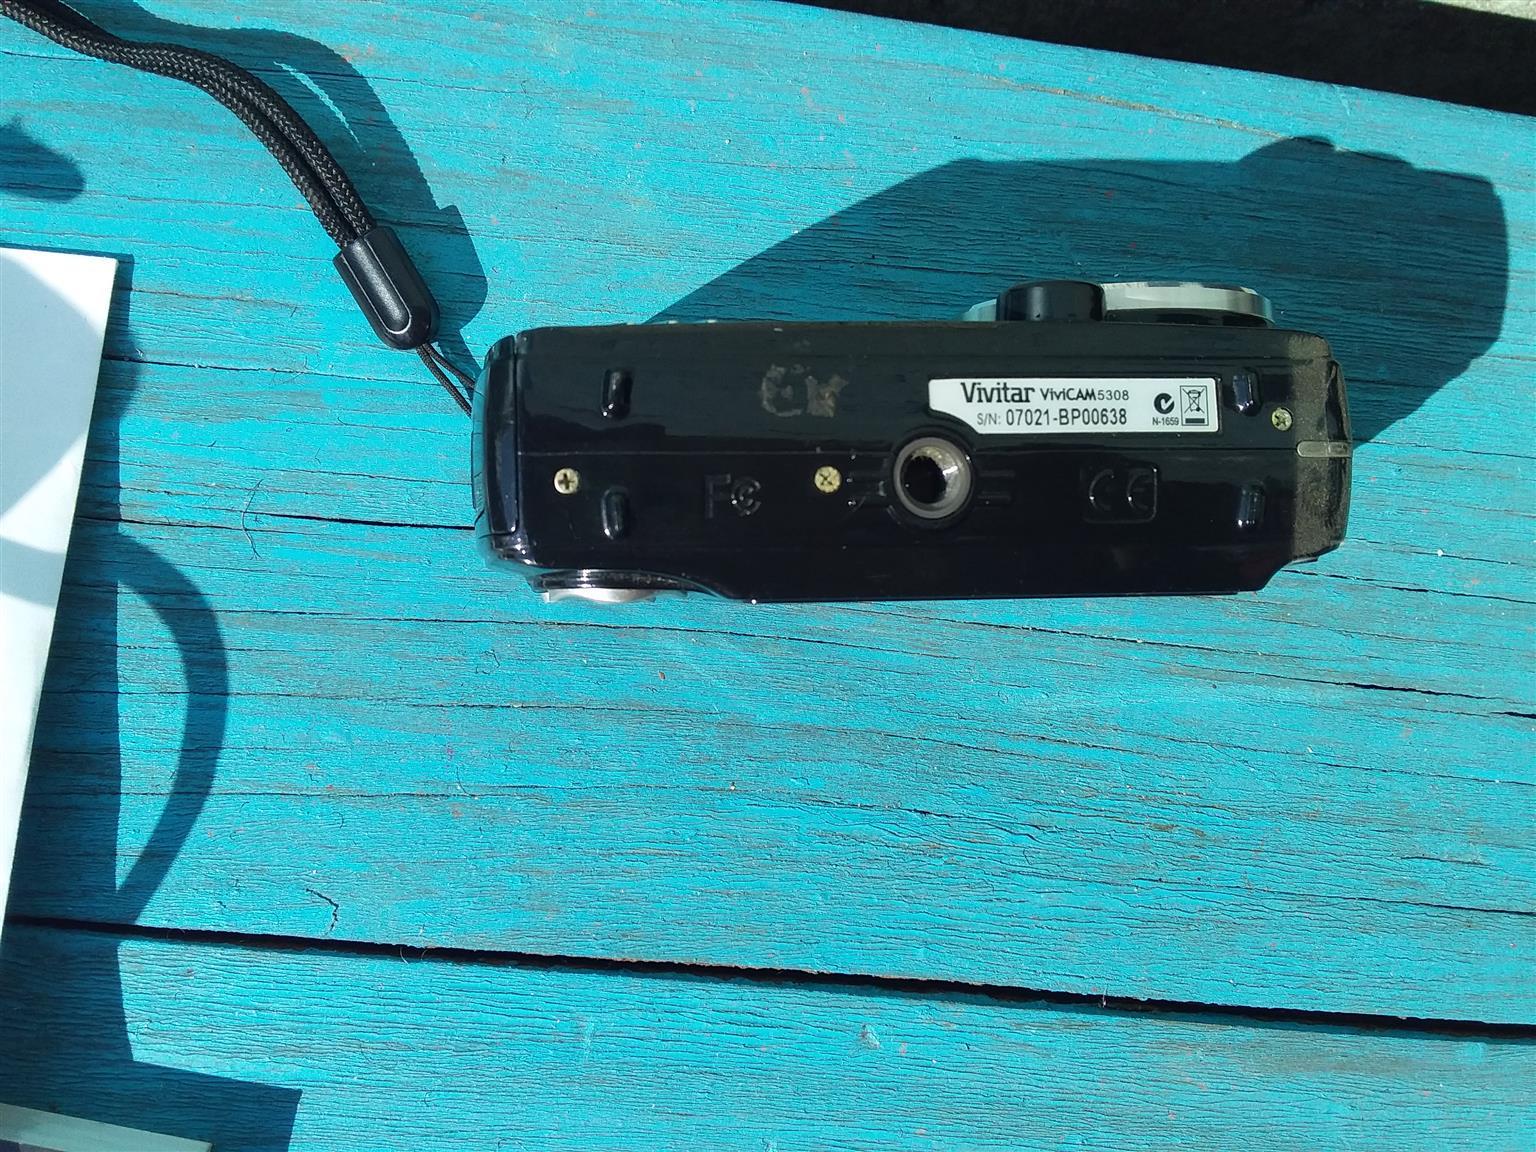 Vivitar digital camera for sale